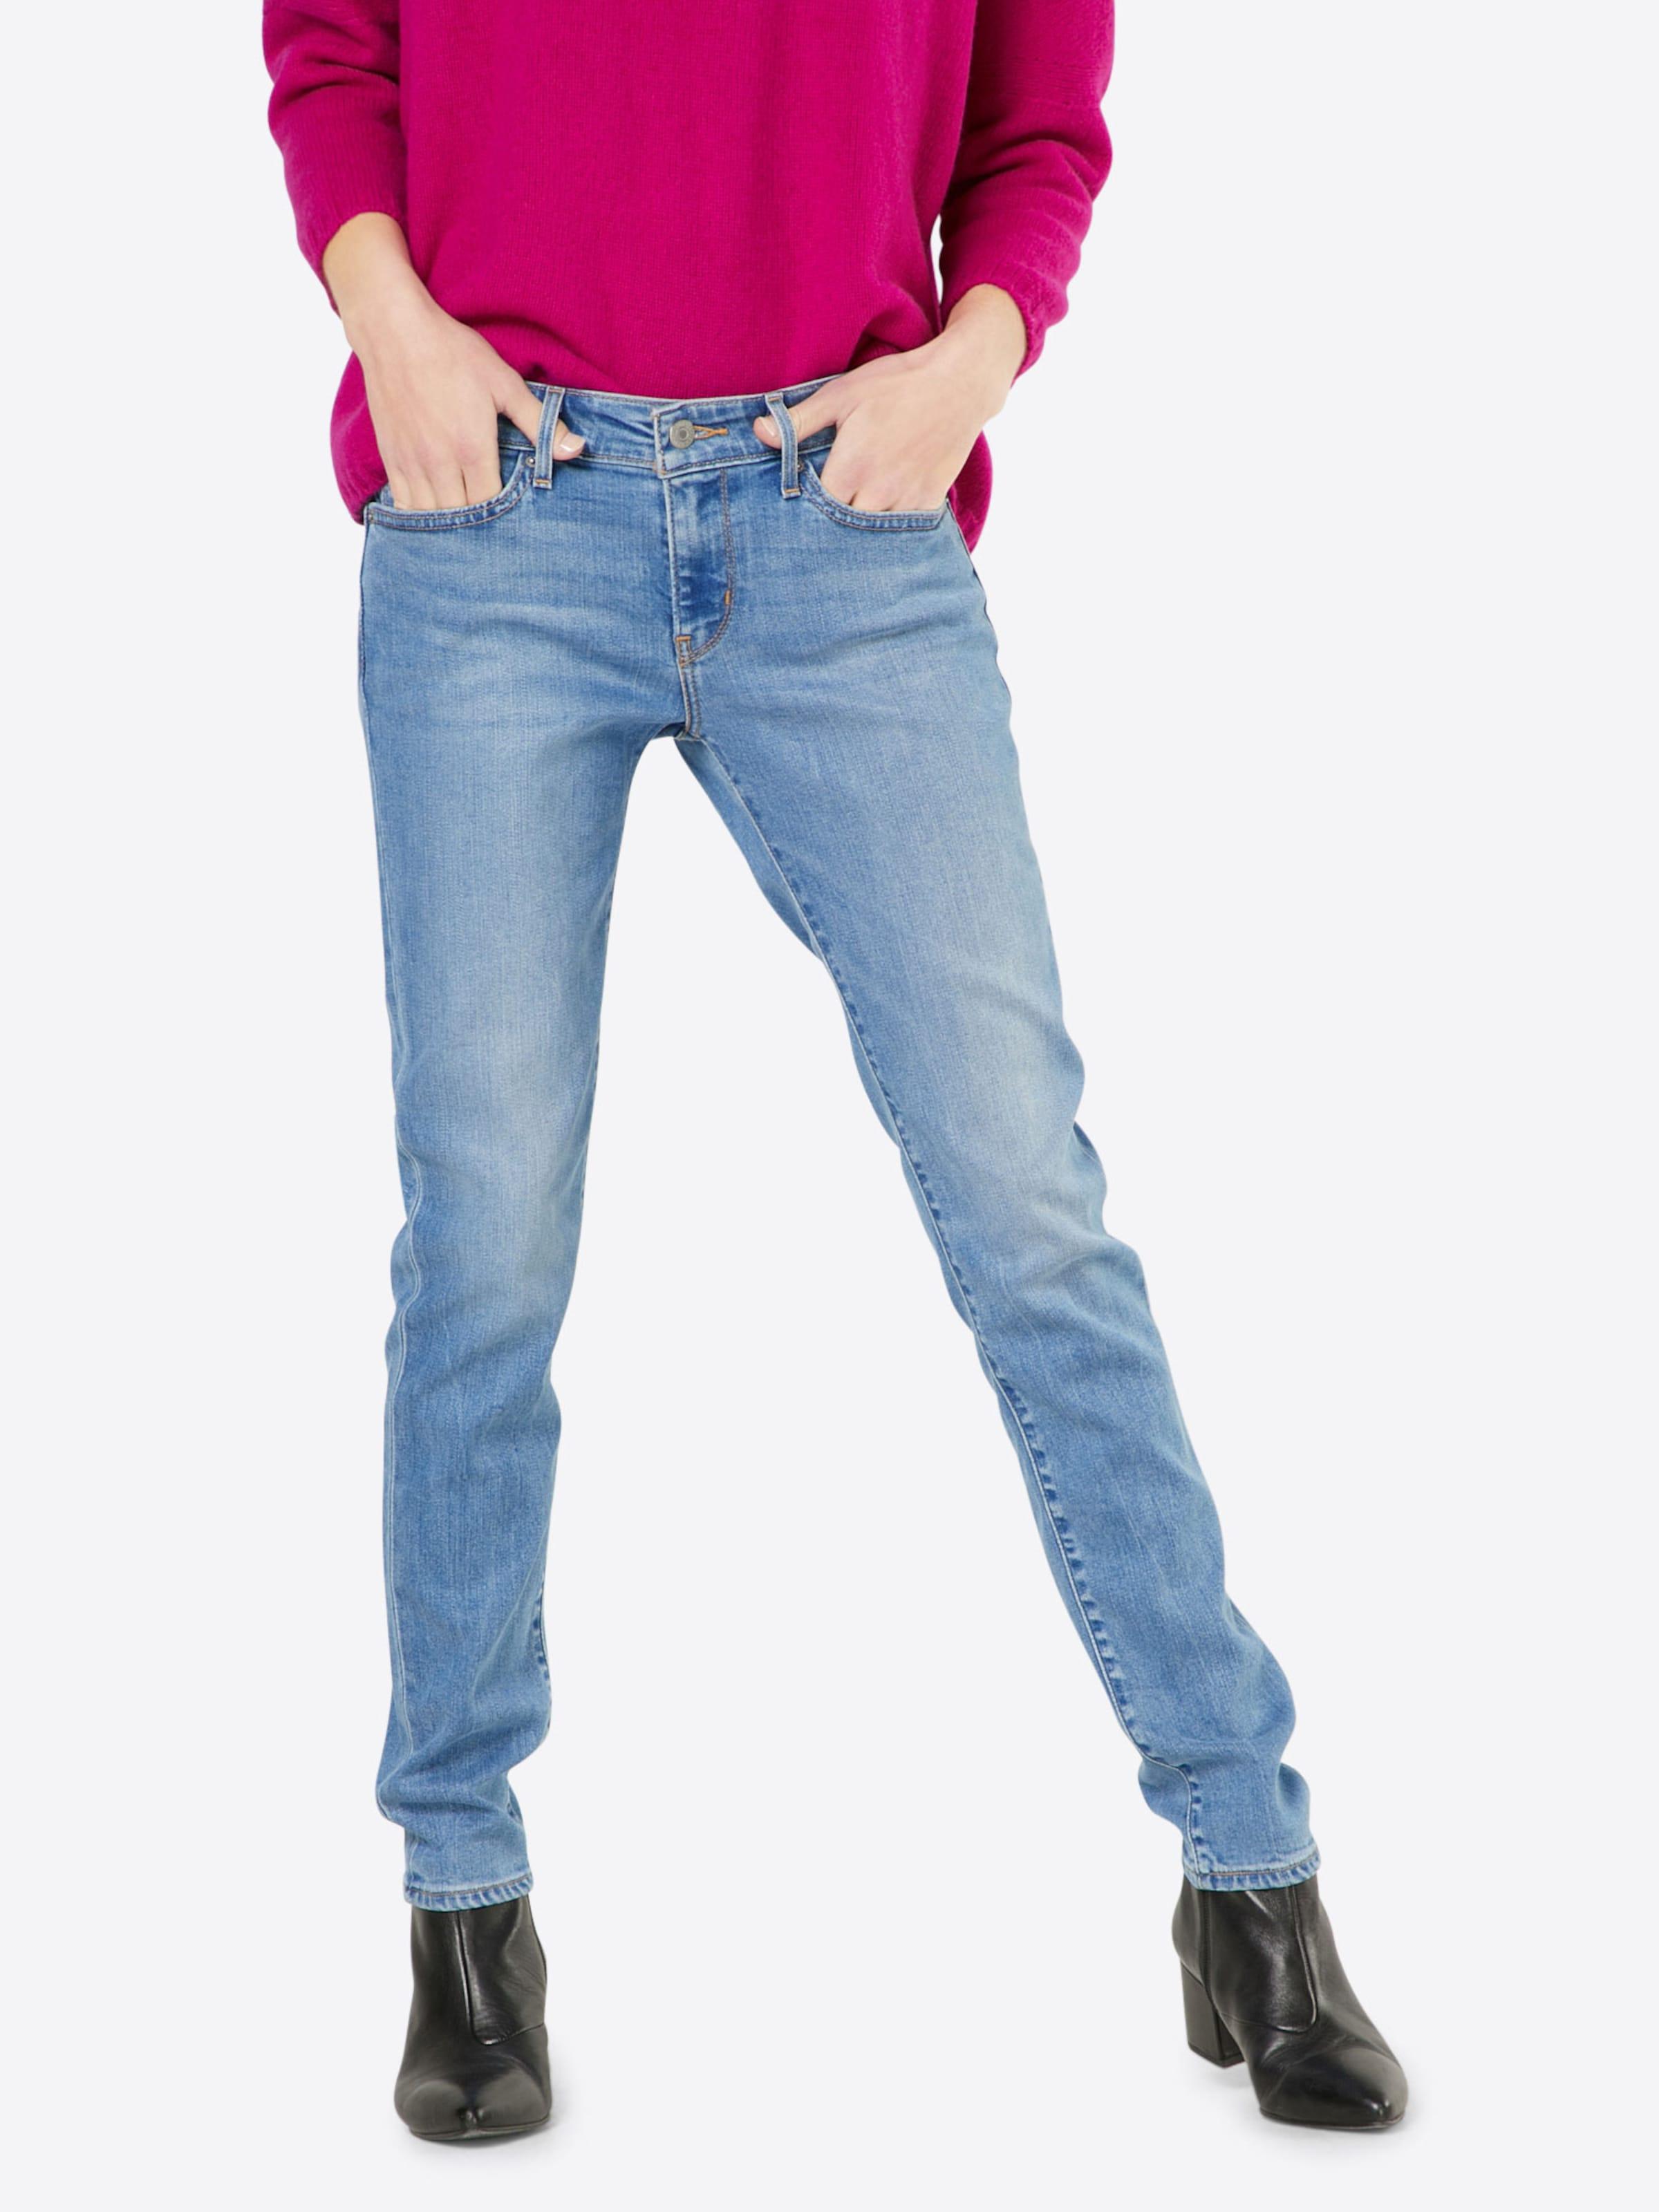 In '711' Jeans Blue Denim Levi's Yb7gyvf6